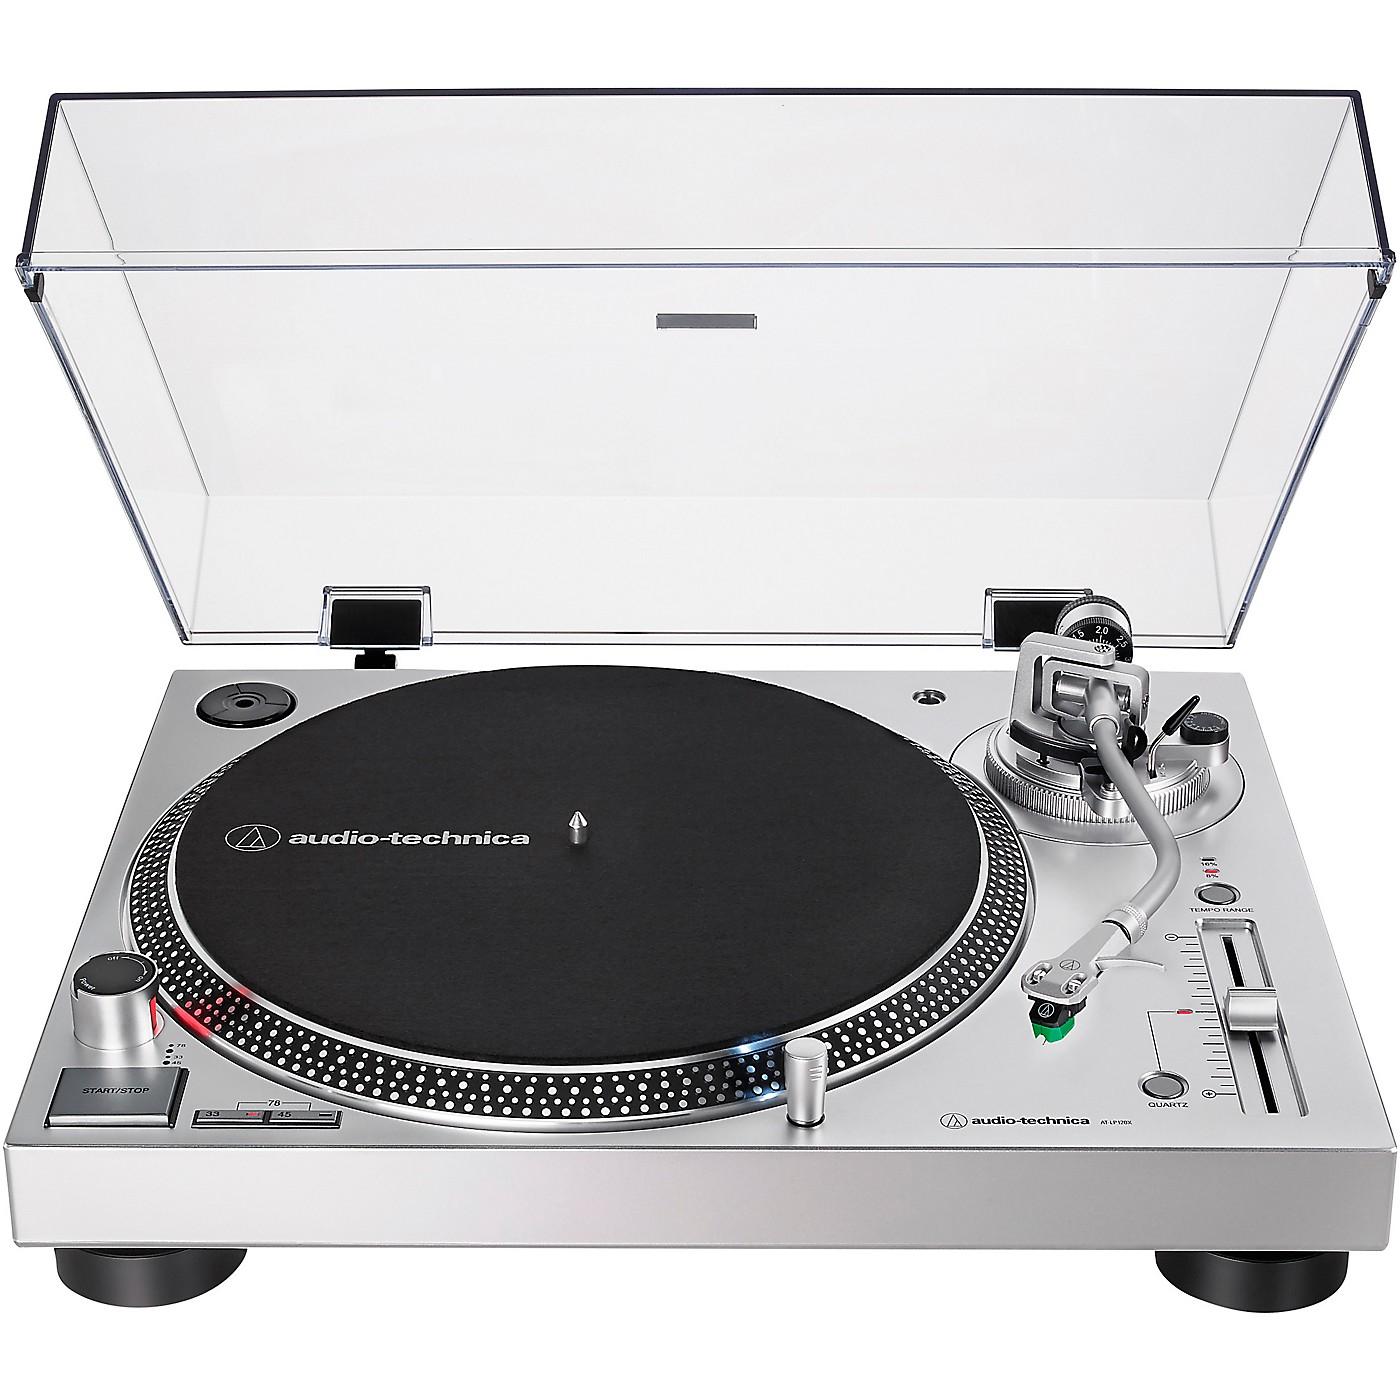 Audio-Technica AT-LP120XUSB Direct-Drive Professional Turntable (USB & Analog) thumbnail